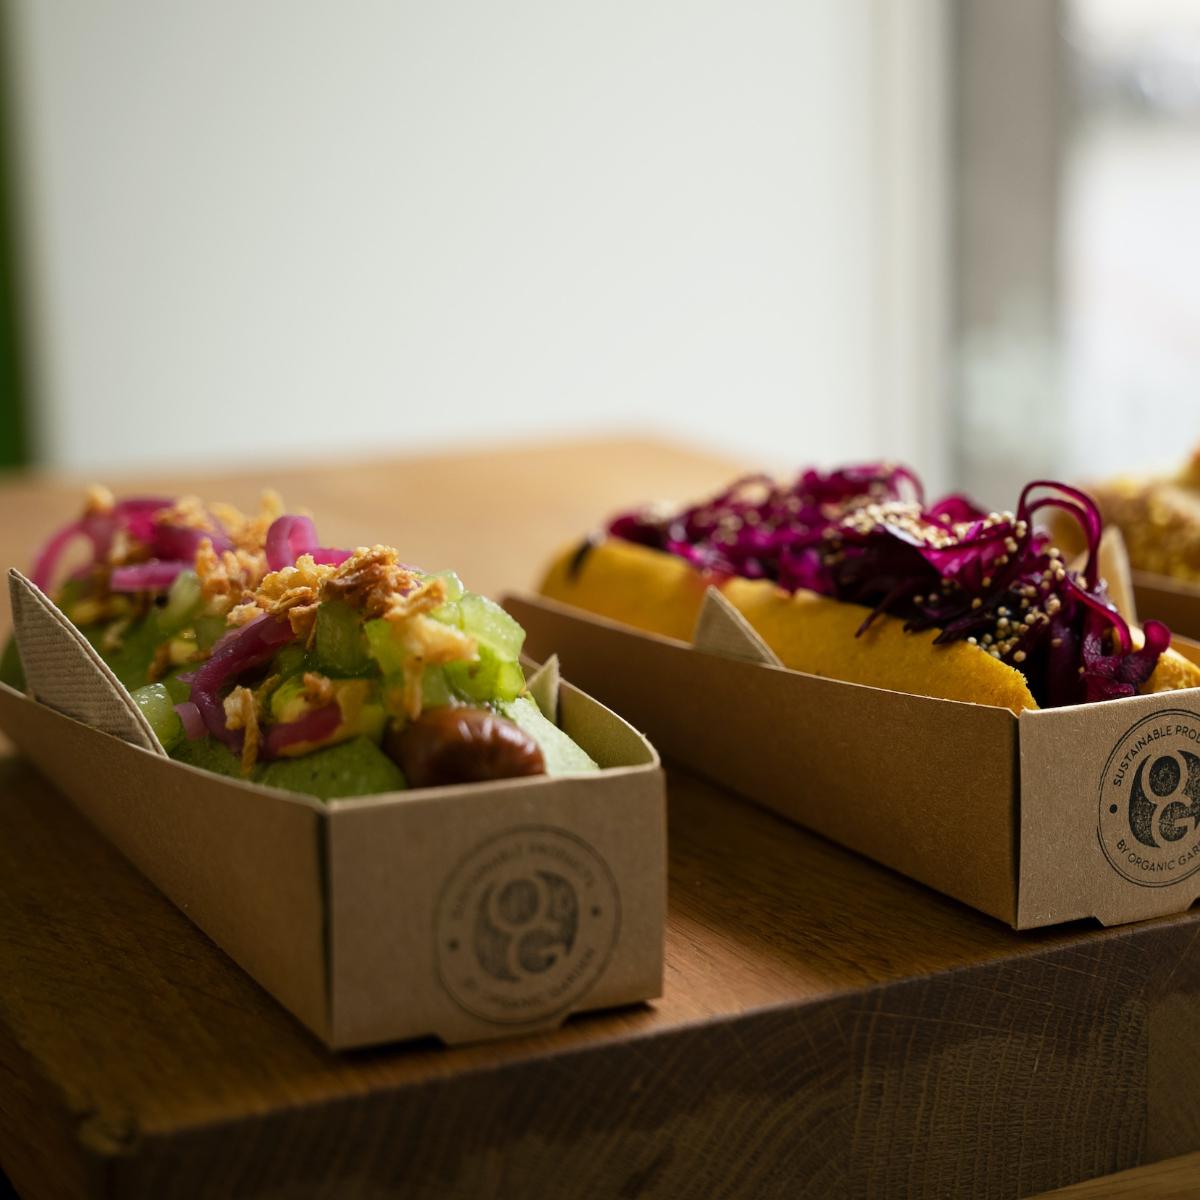 Organic Garden Gourmet Hotdog Muenchen